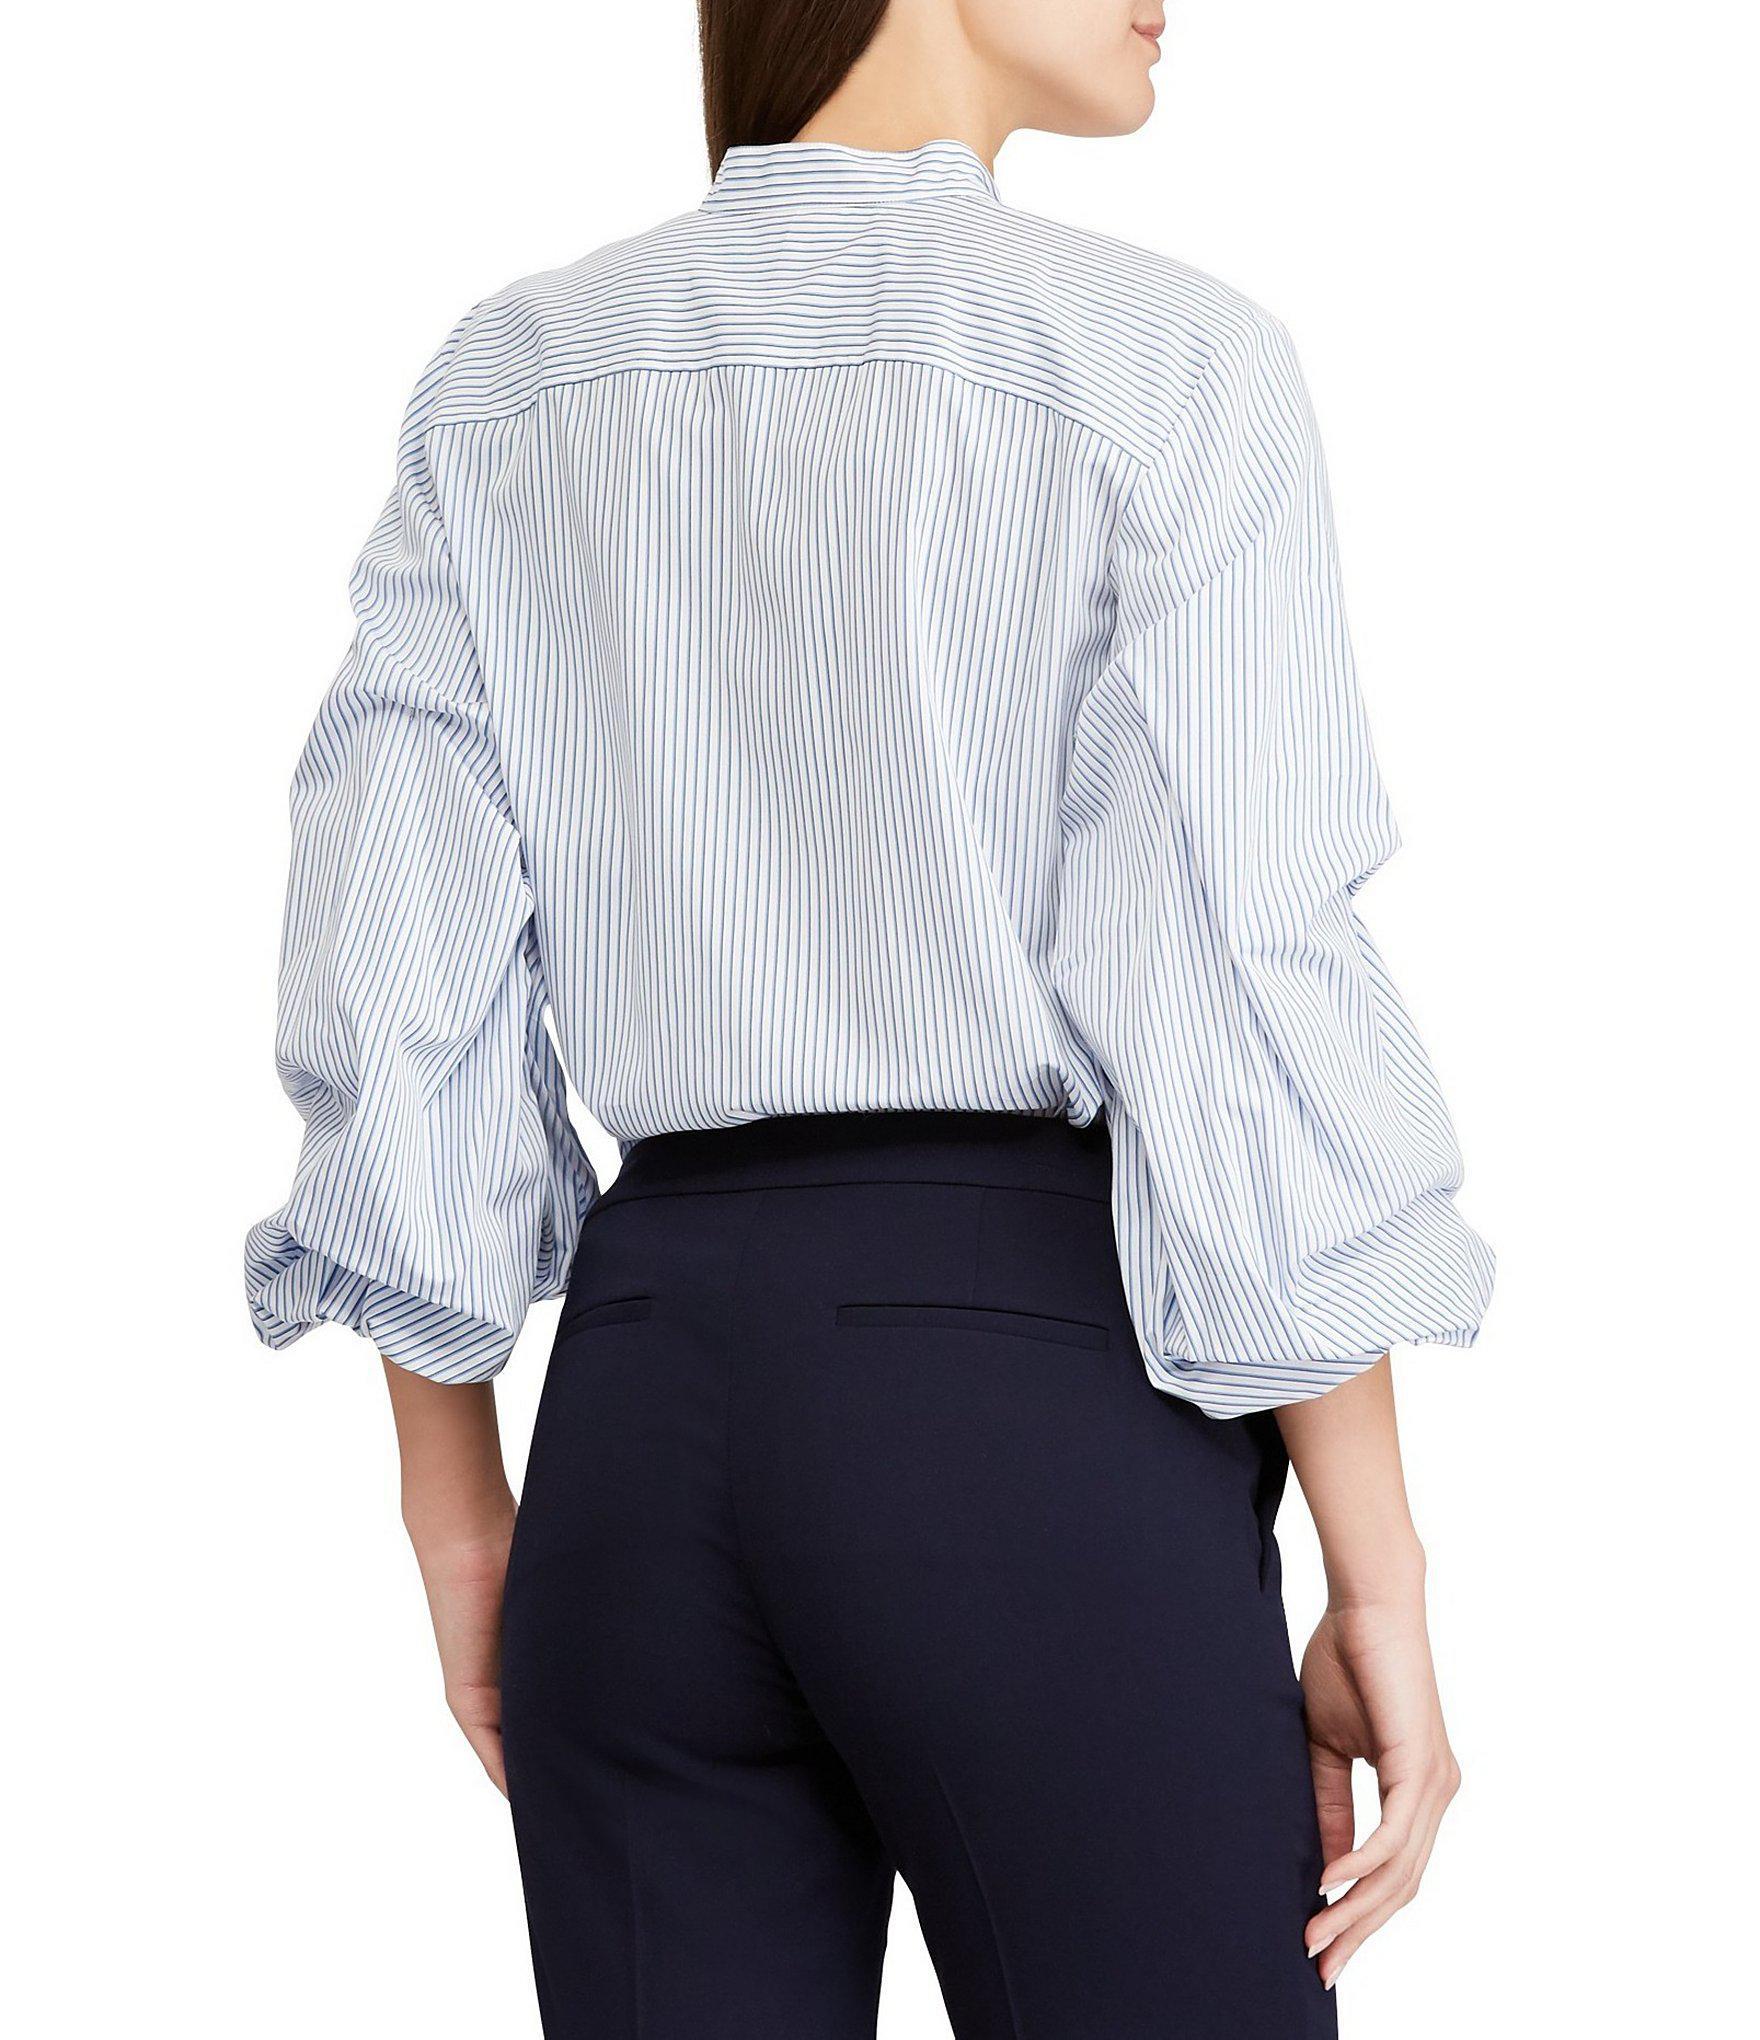 0dcc32f6e69 Lyst - Lauren by Ralph Lauren Tiered Puffed-sleeve Cotton Shirt in Blue